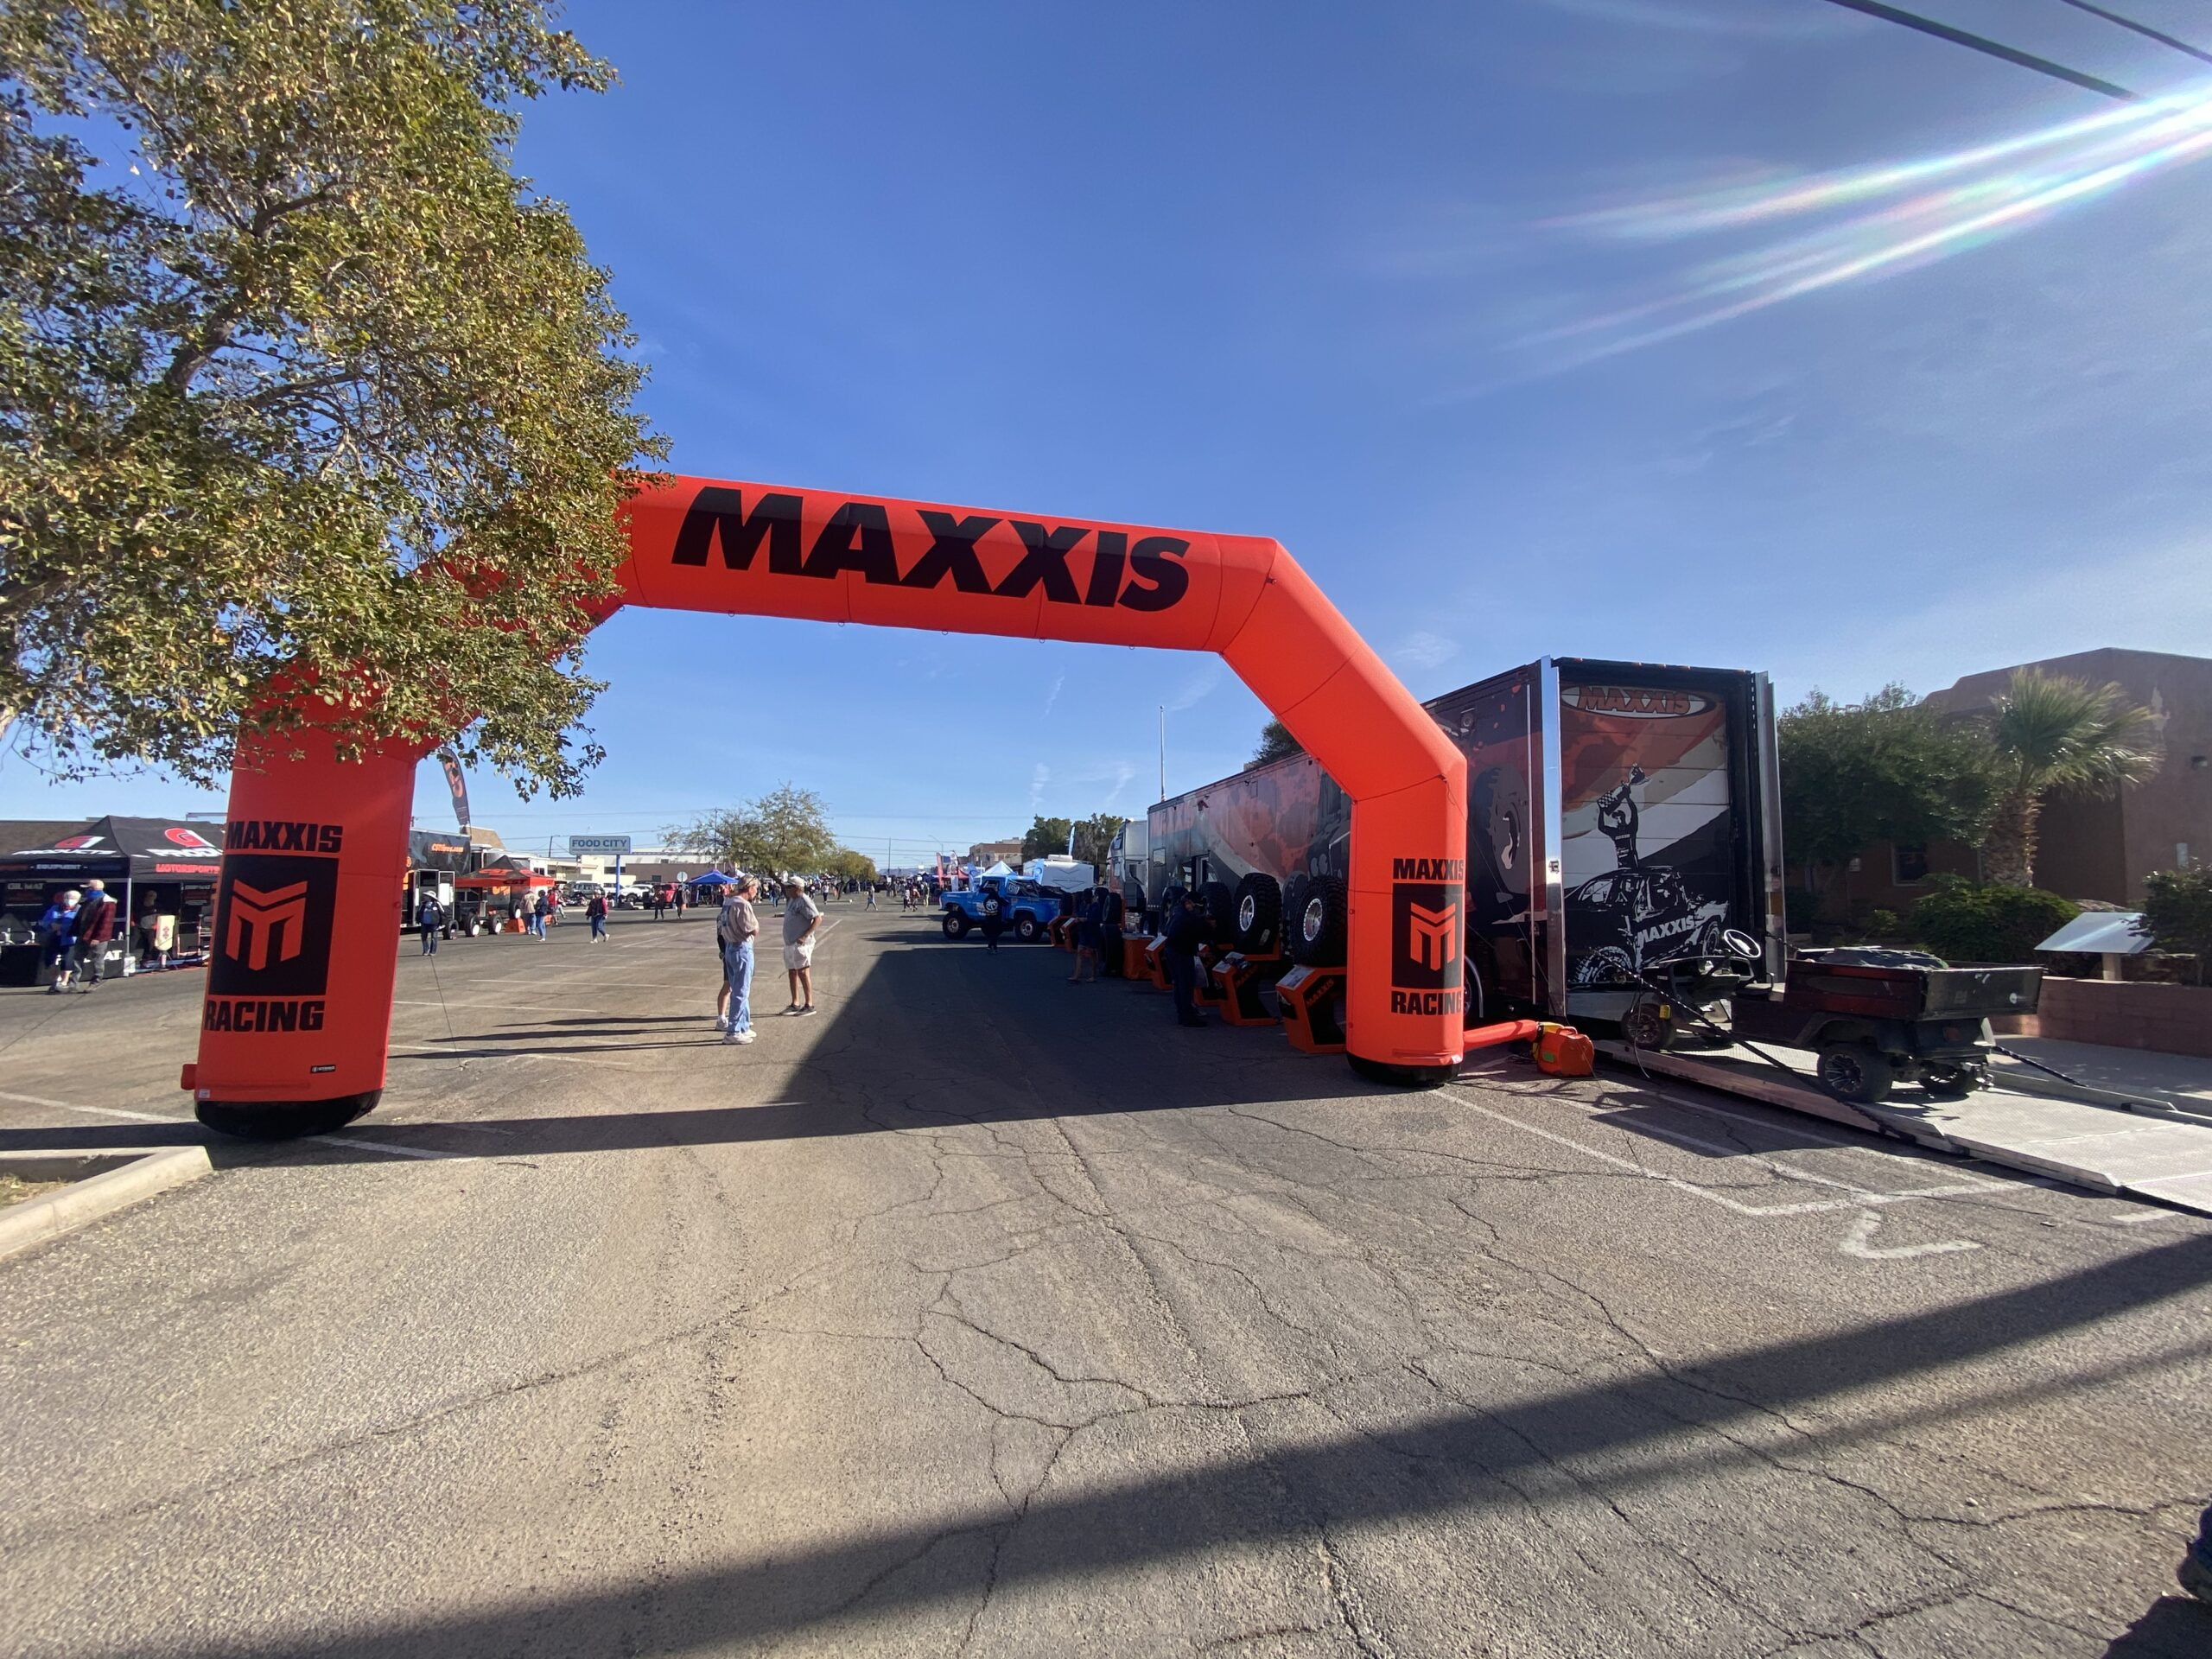 Maxxiss finish line at BITD event